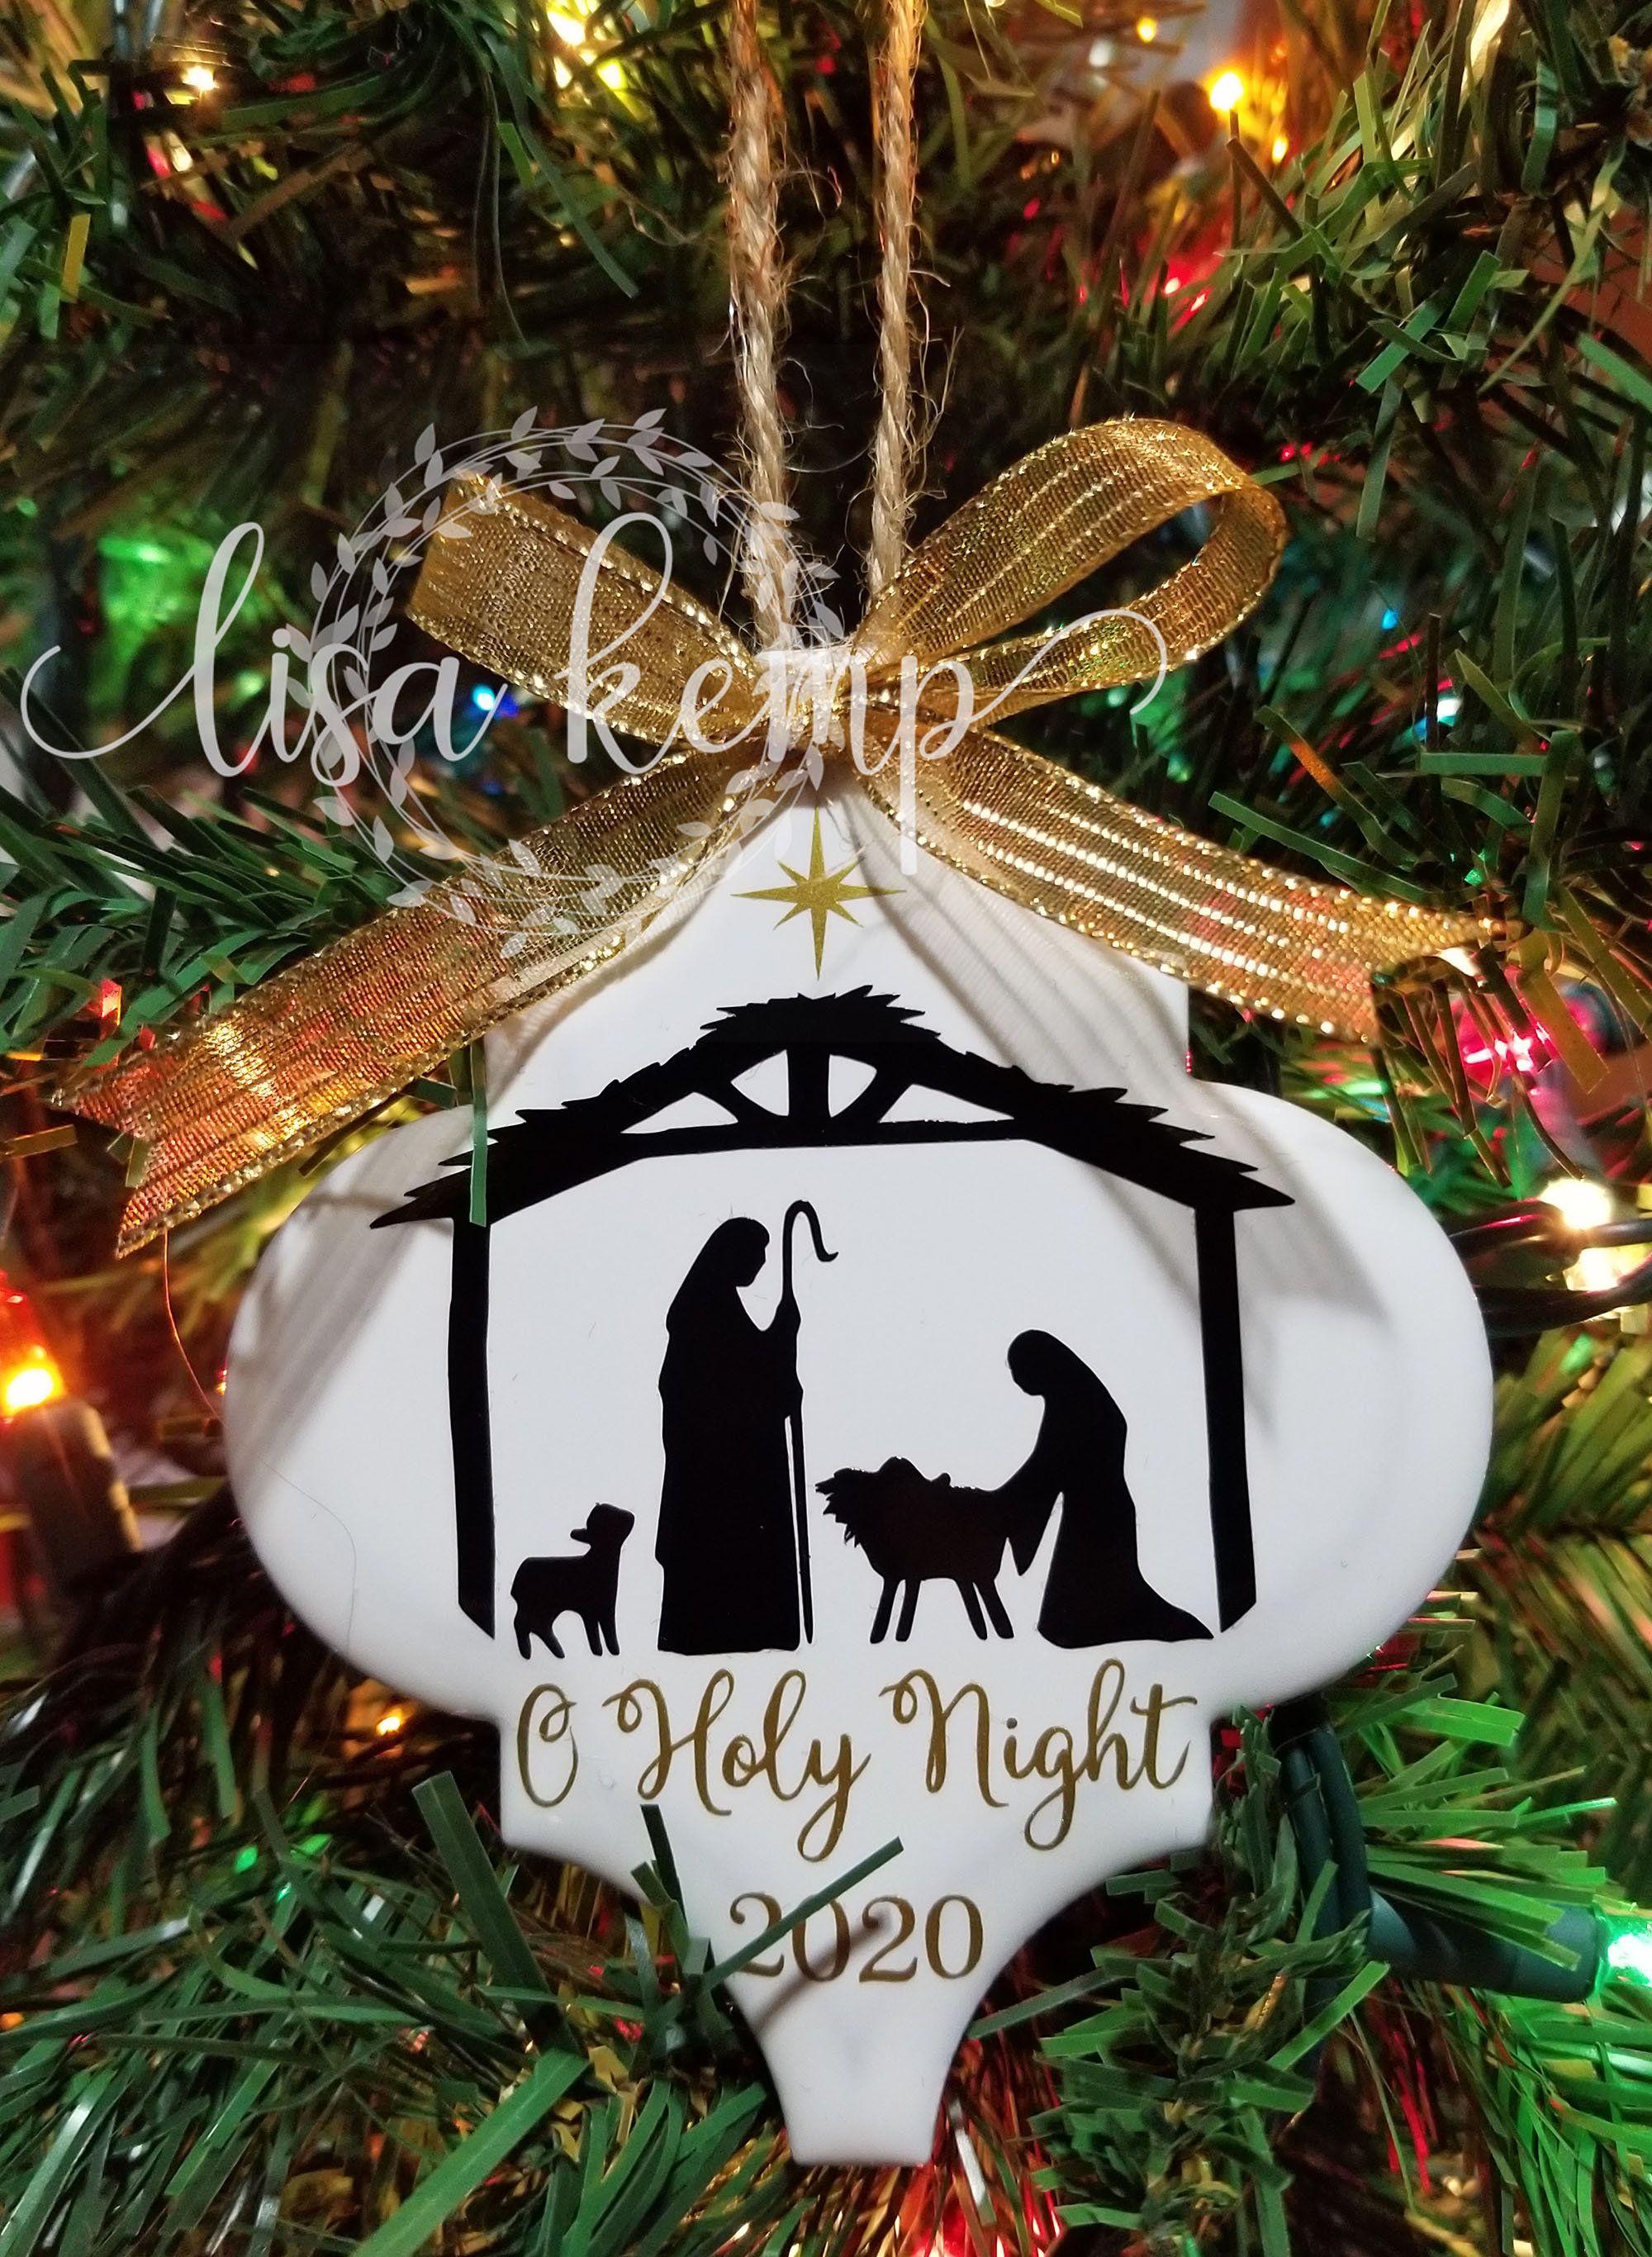 O Holy Night Nativity Scene Ceramic Lantern Tile Ornament In 2020 Christmas Ornaments Diy Christmas Ornaments Christmas Tree Ornaments